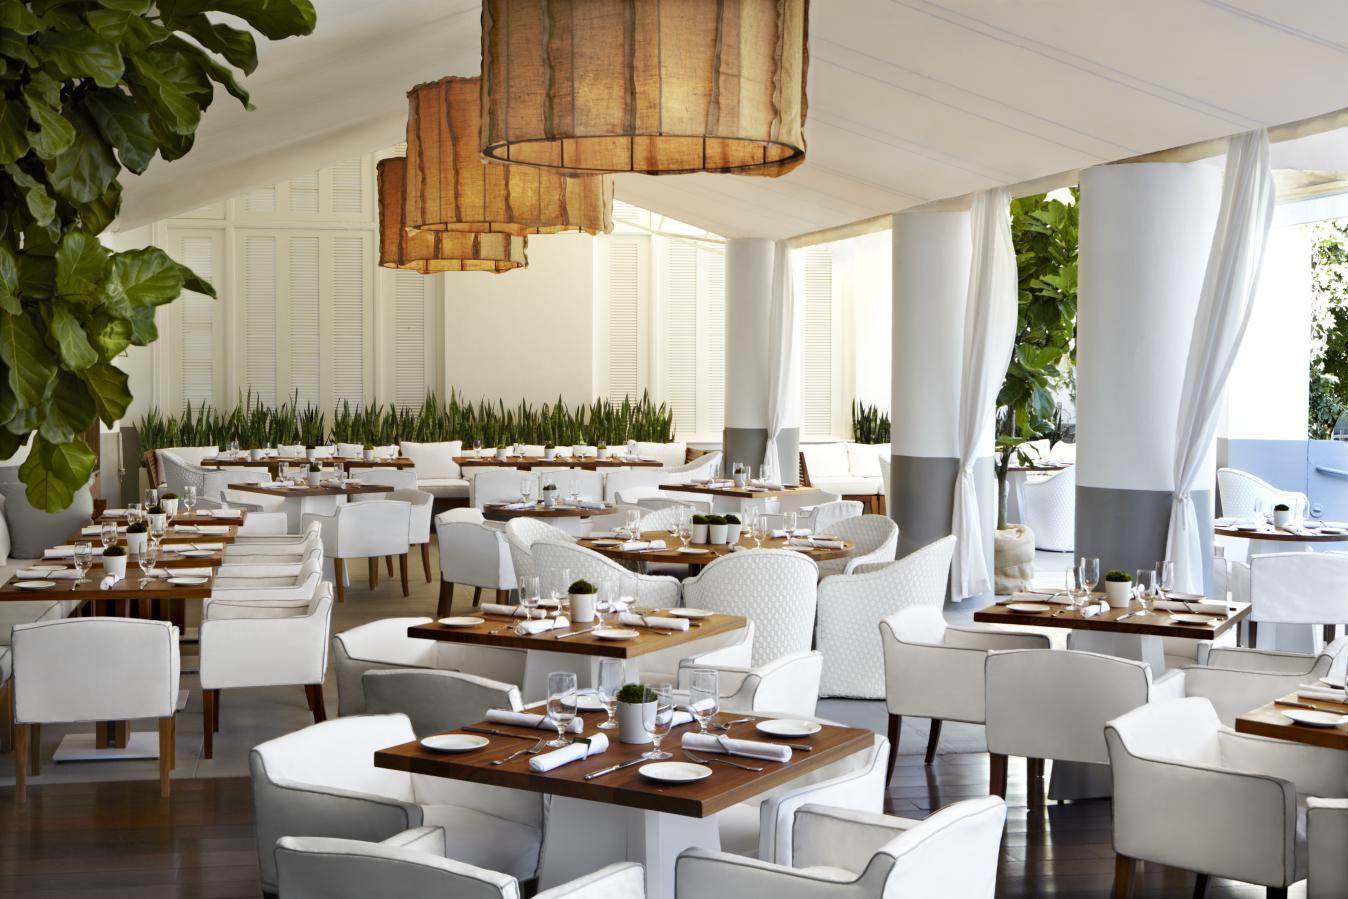 bianca at the delano hotel in miami beach - simple clean elegant